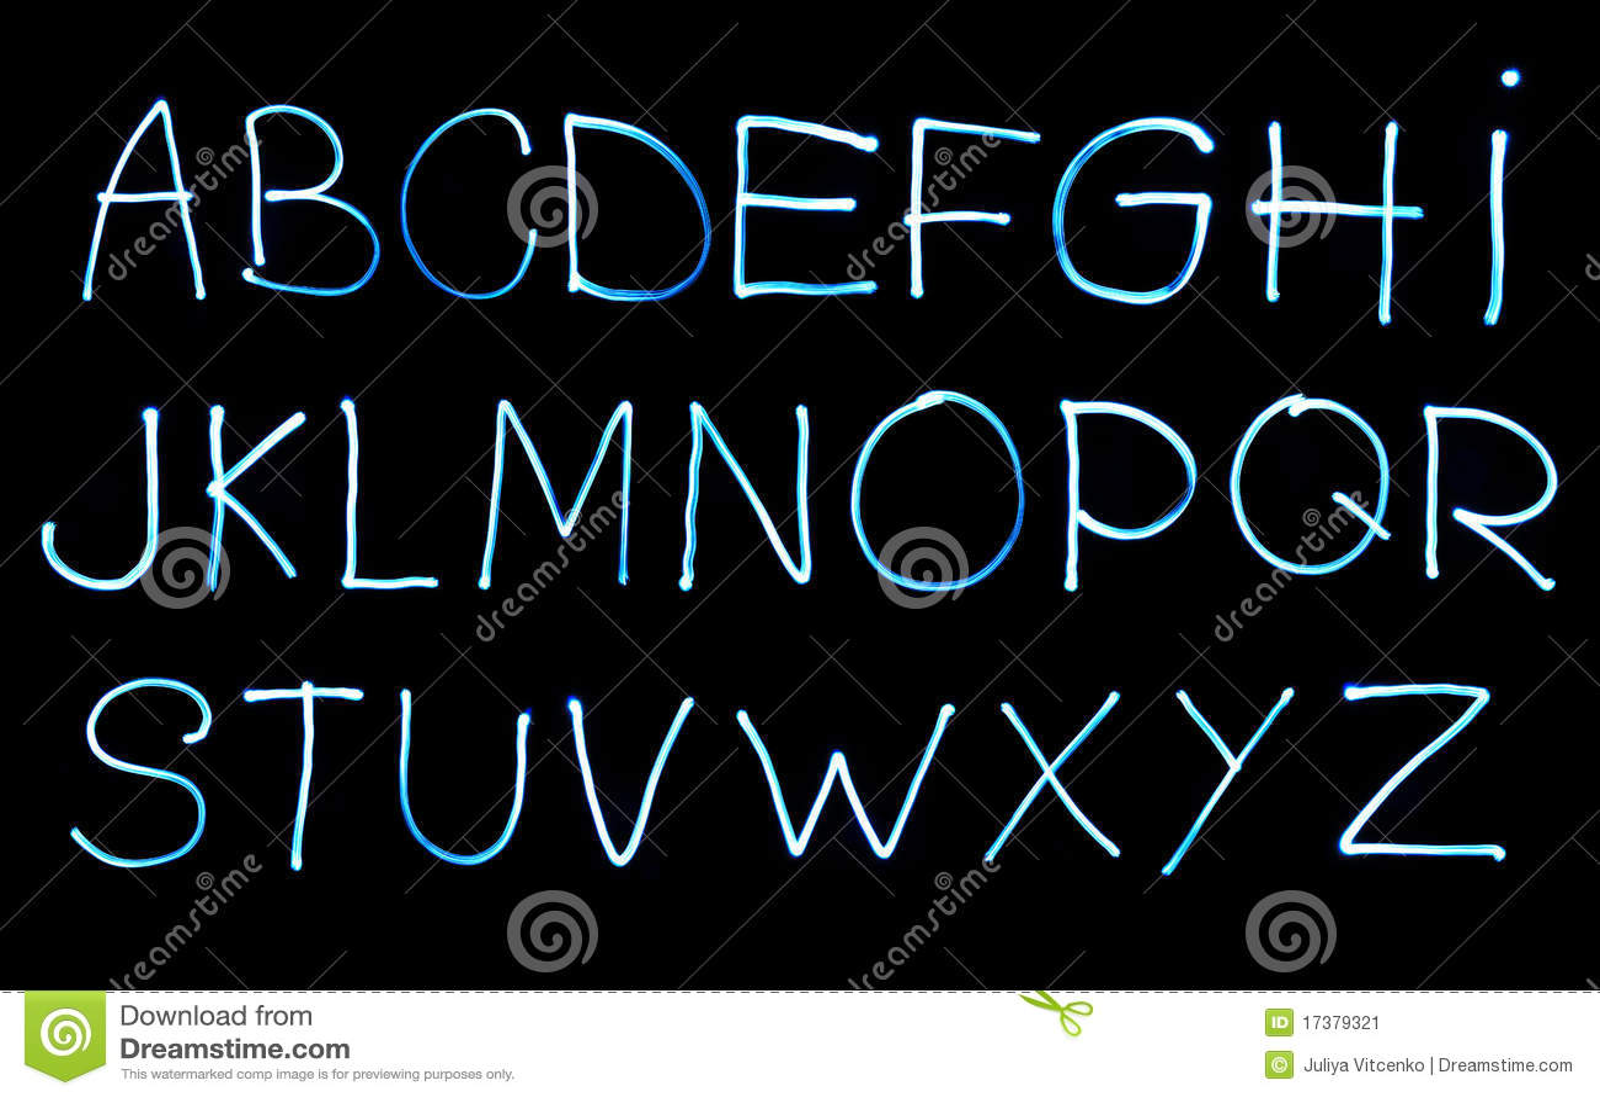 Alphabet created with light